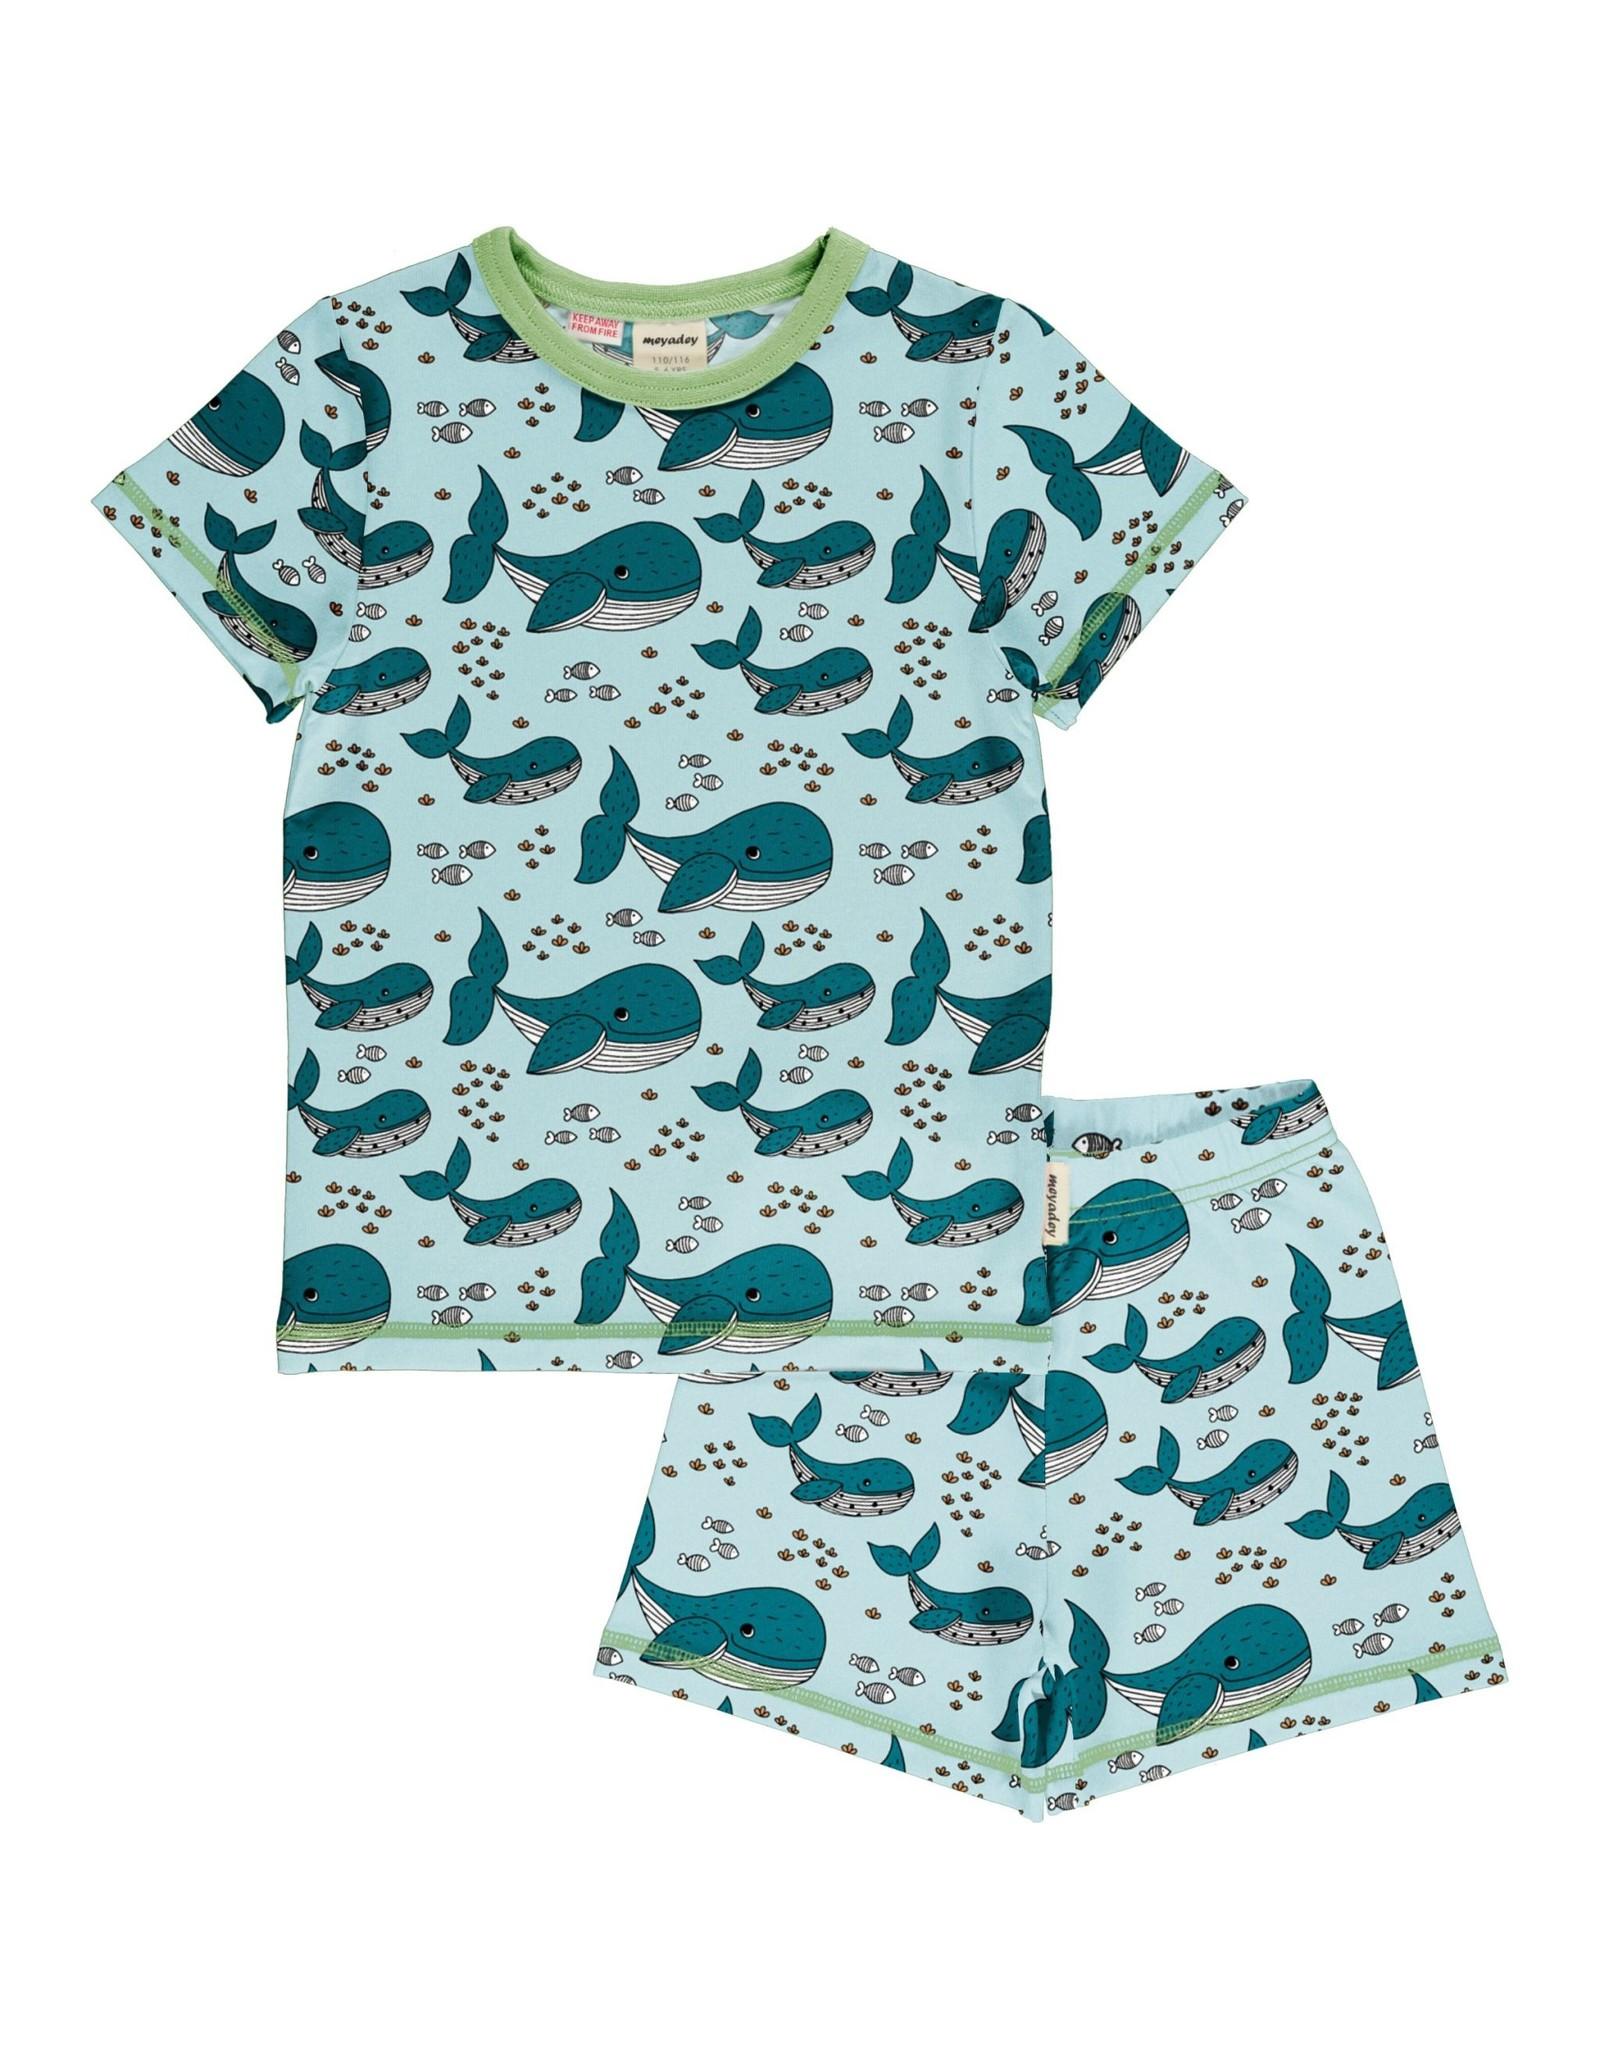 Meyadey Zomerpyjama met walvis print